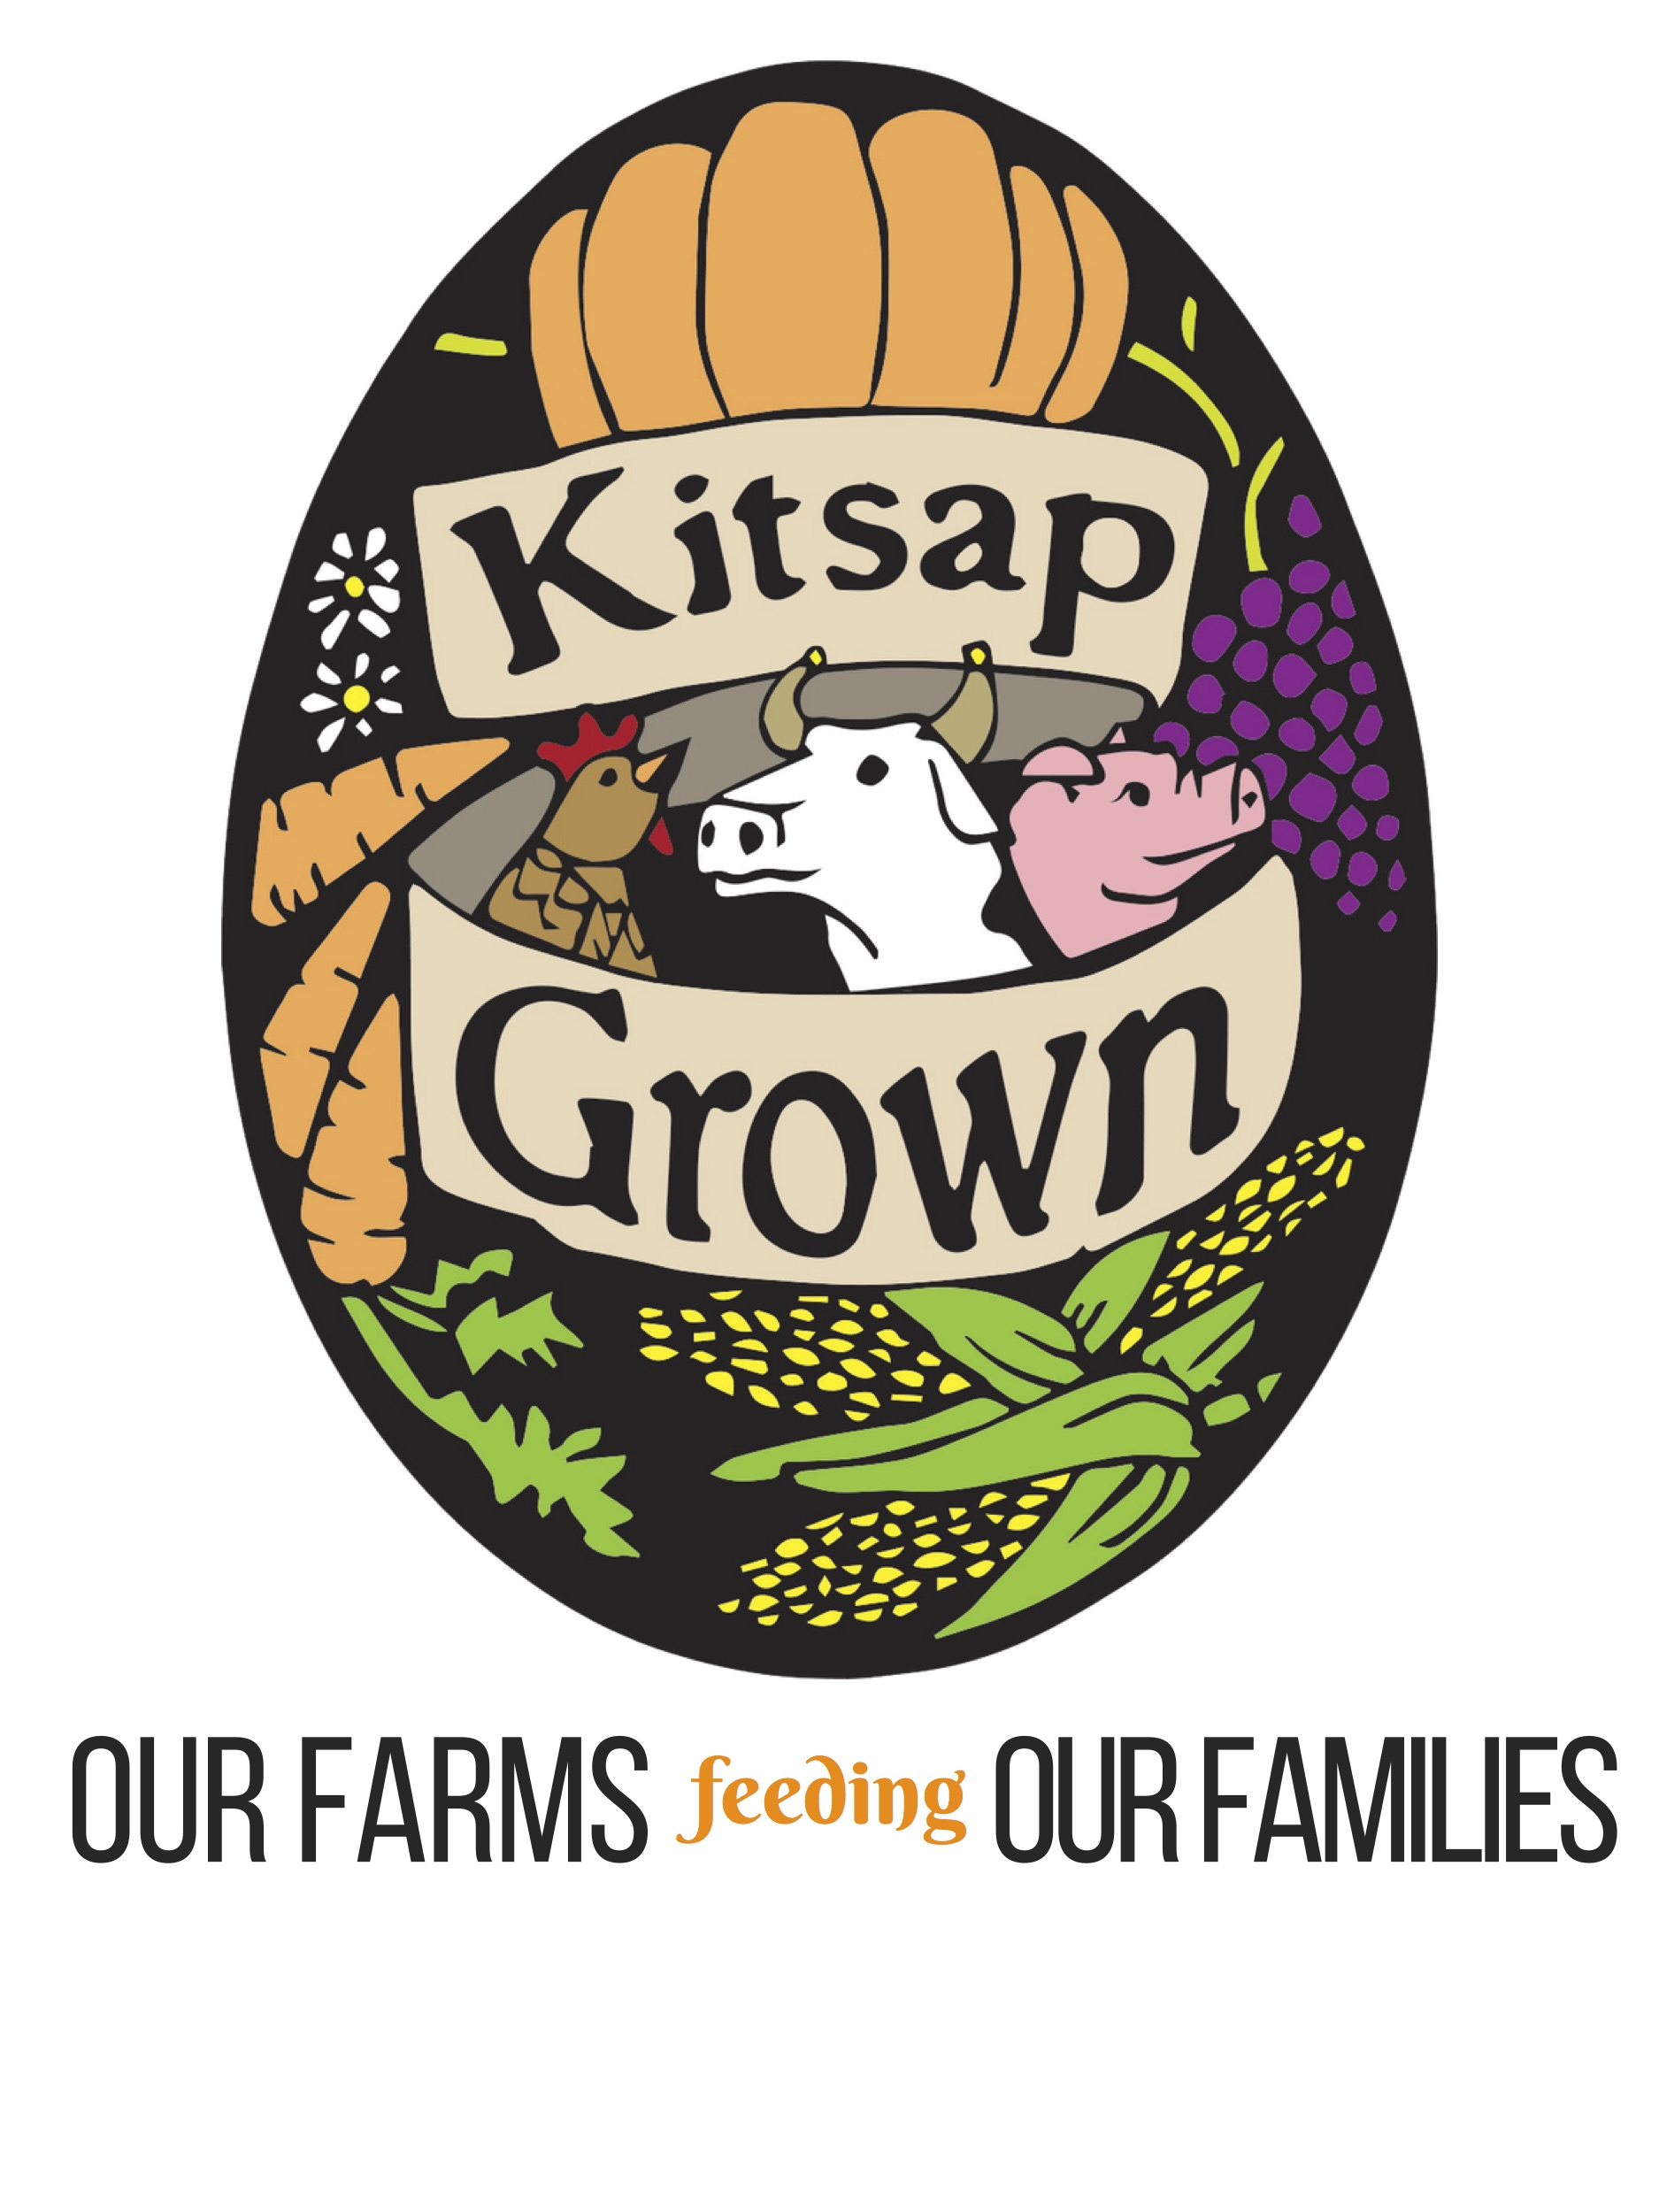 Kitsap Grown_Our Farms Our Families copy.jpg